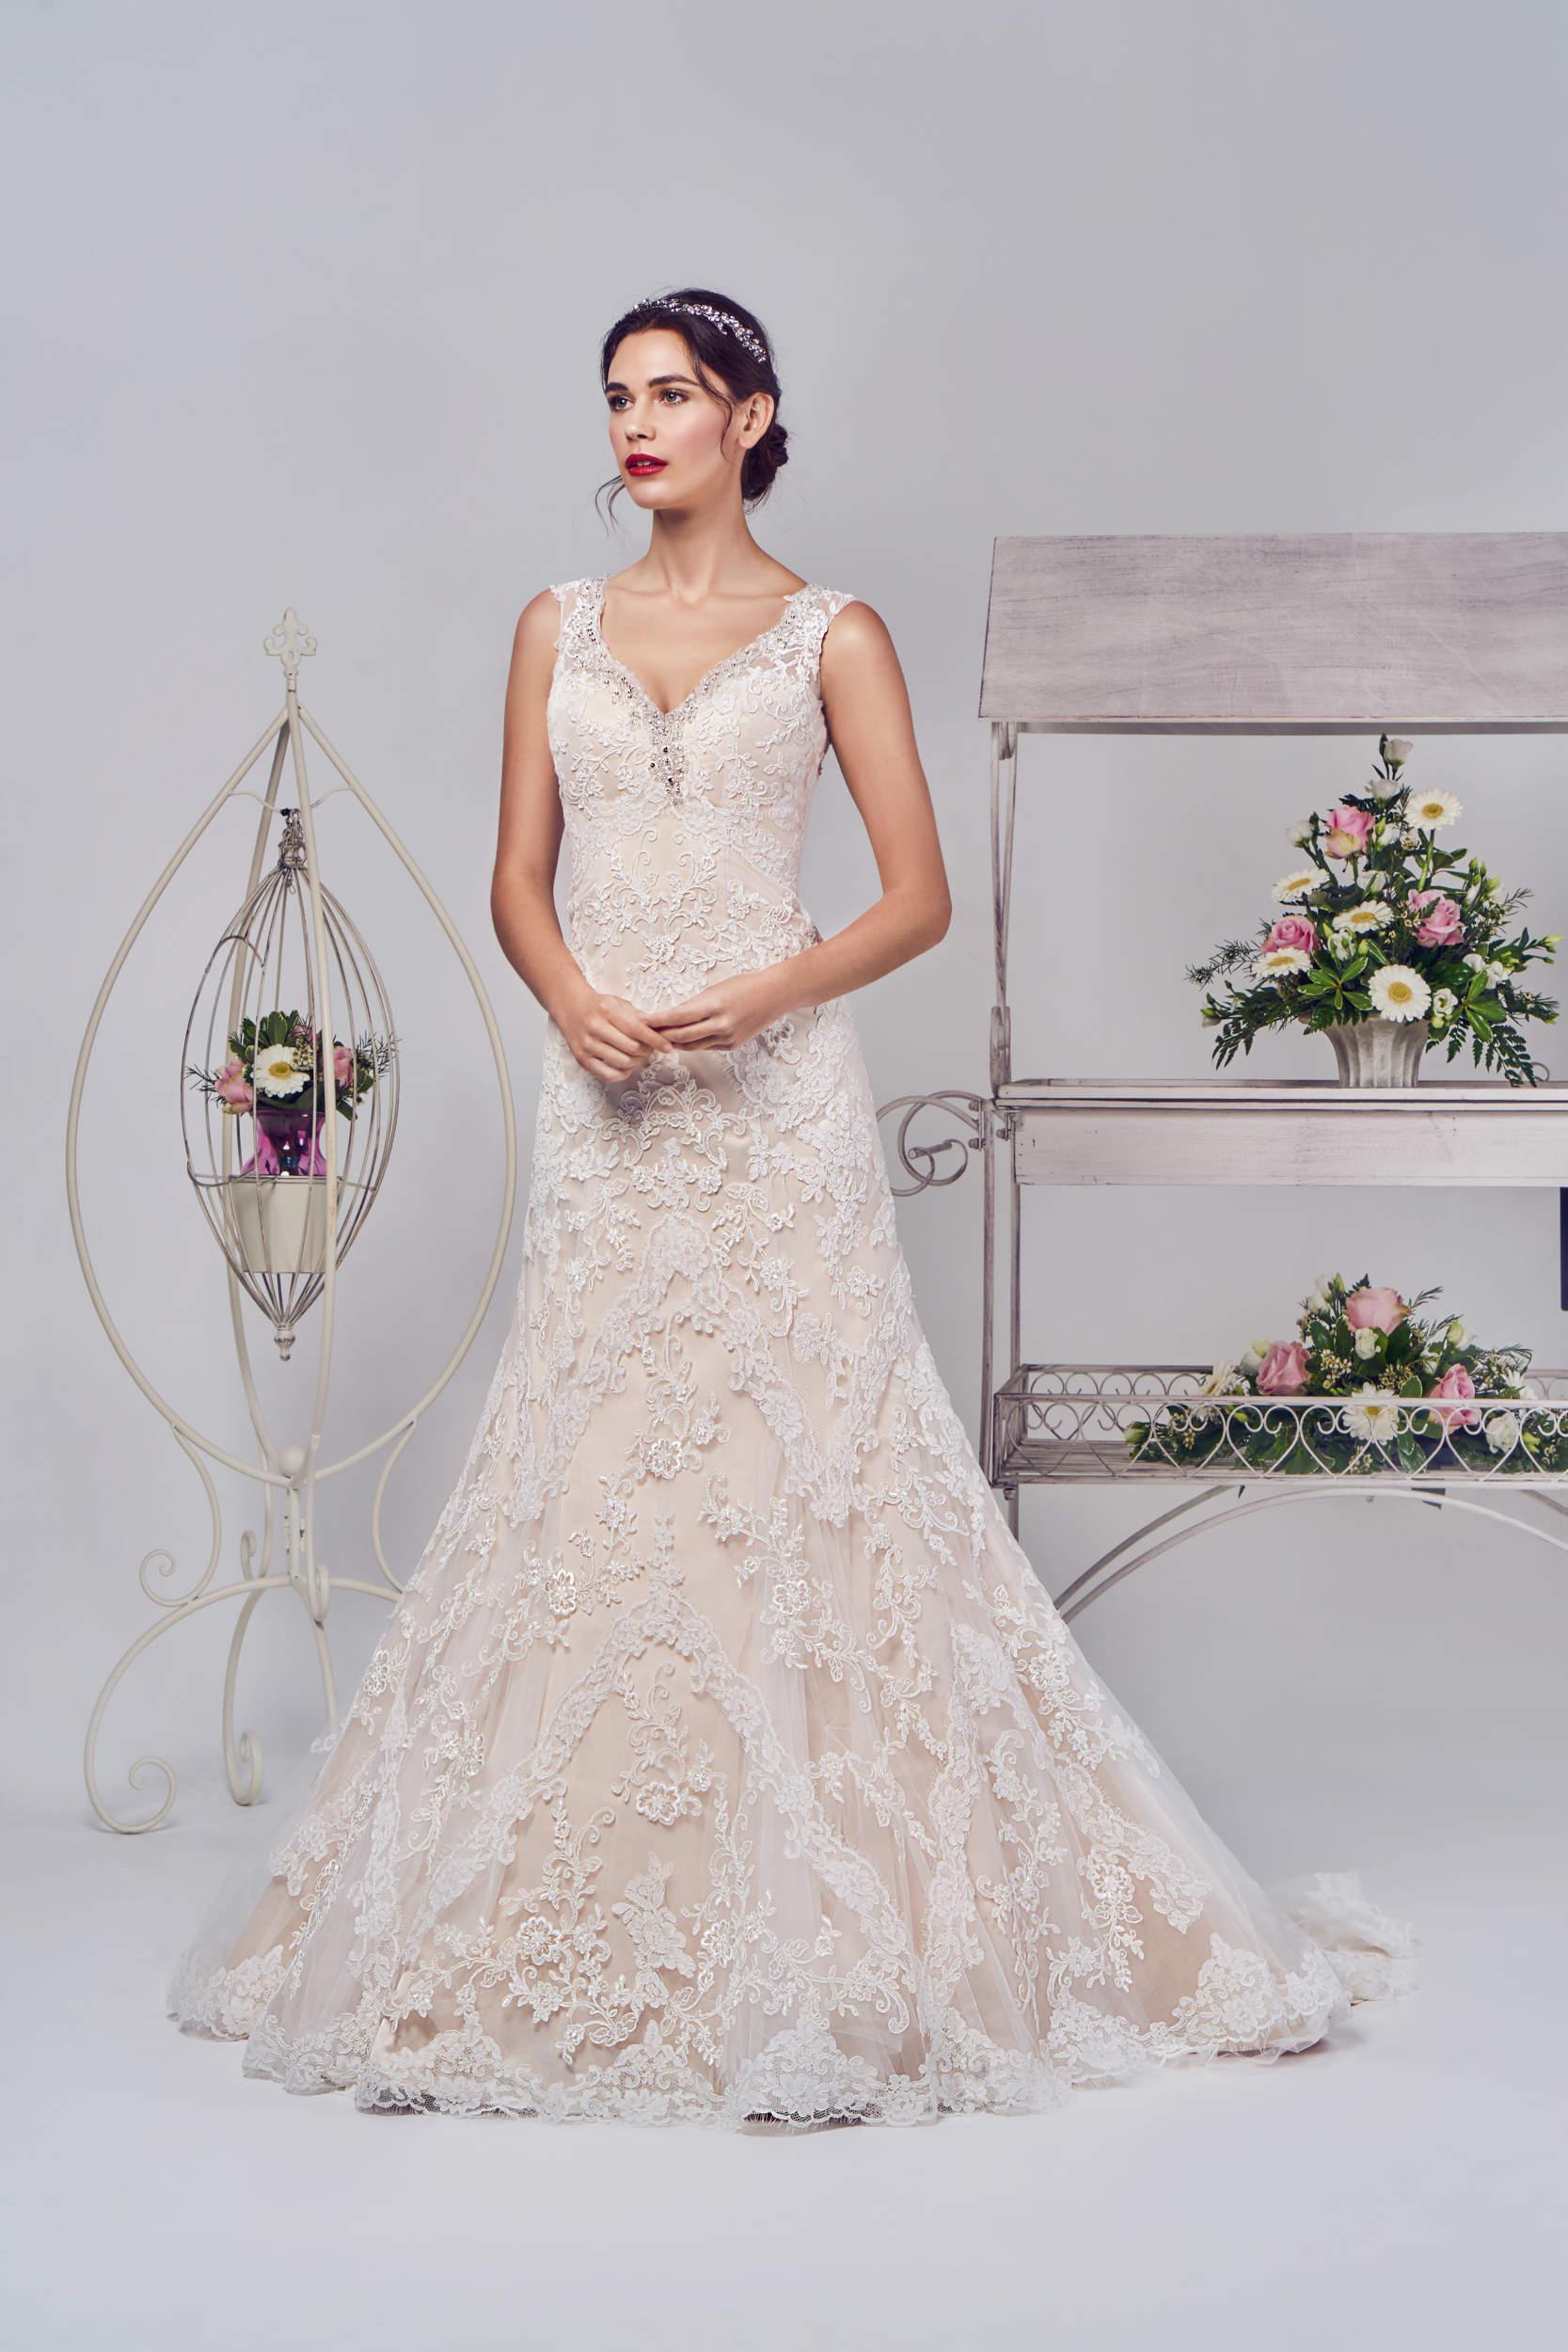 Wedding Dress Preston Bridesmaid Dresses Wedding Suits Bridal Gowns